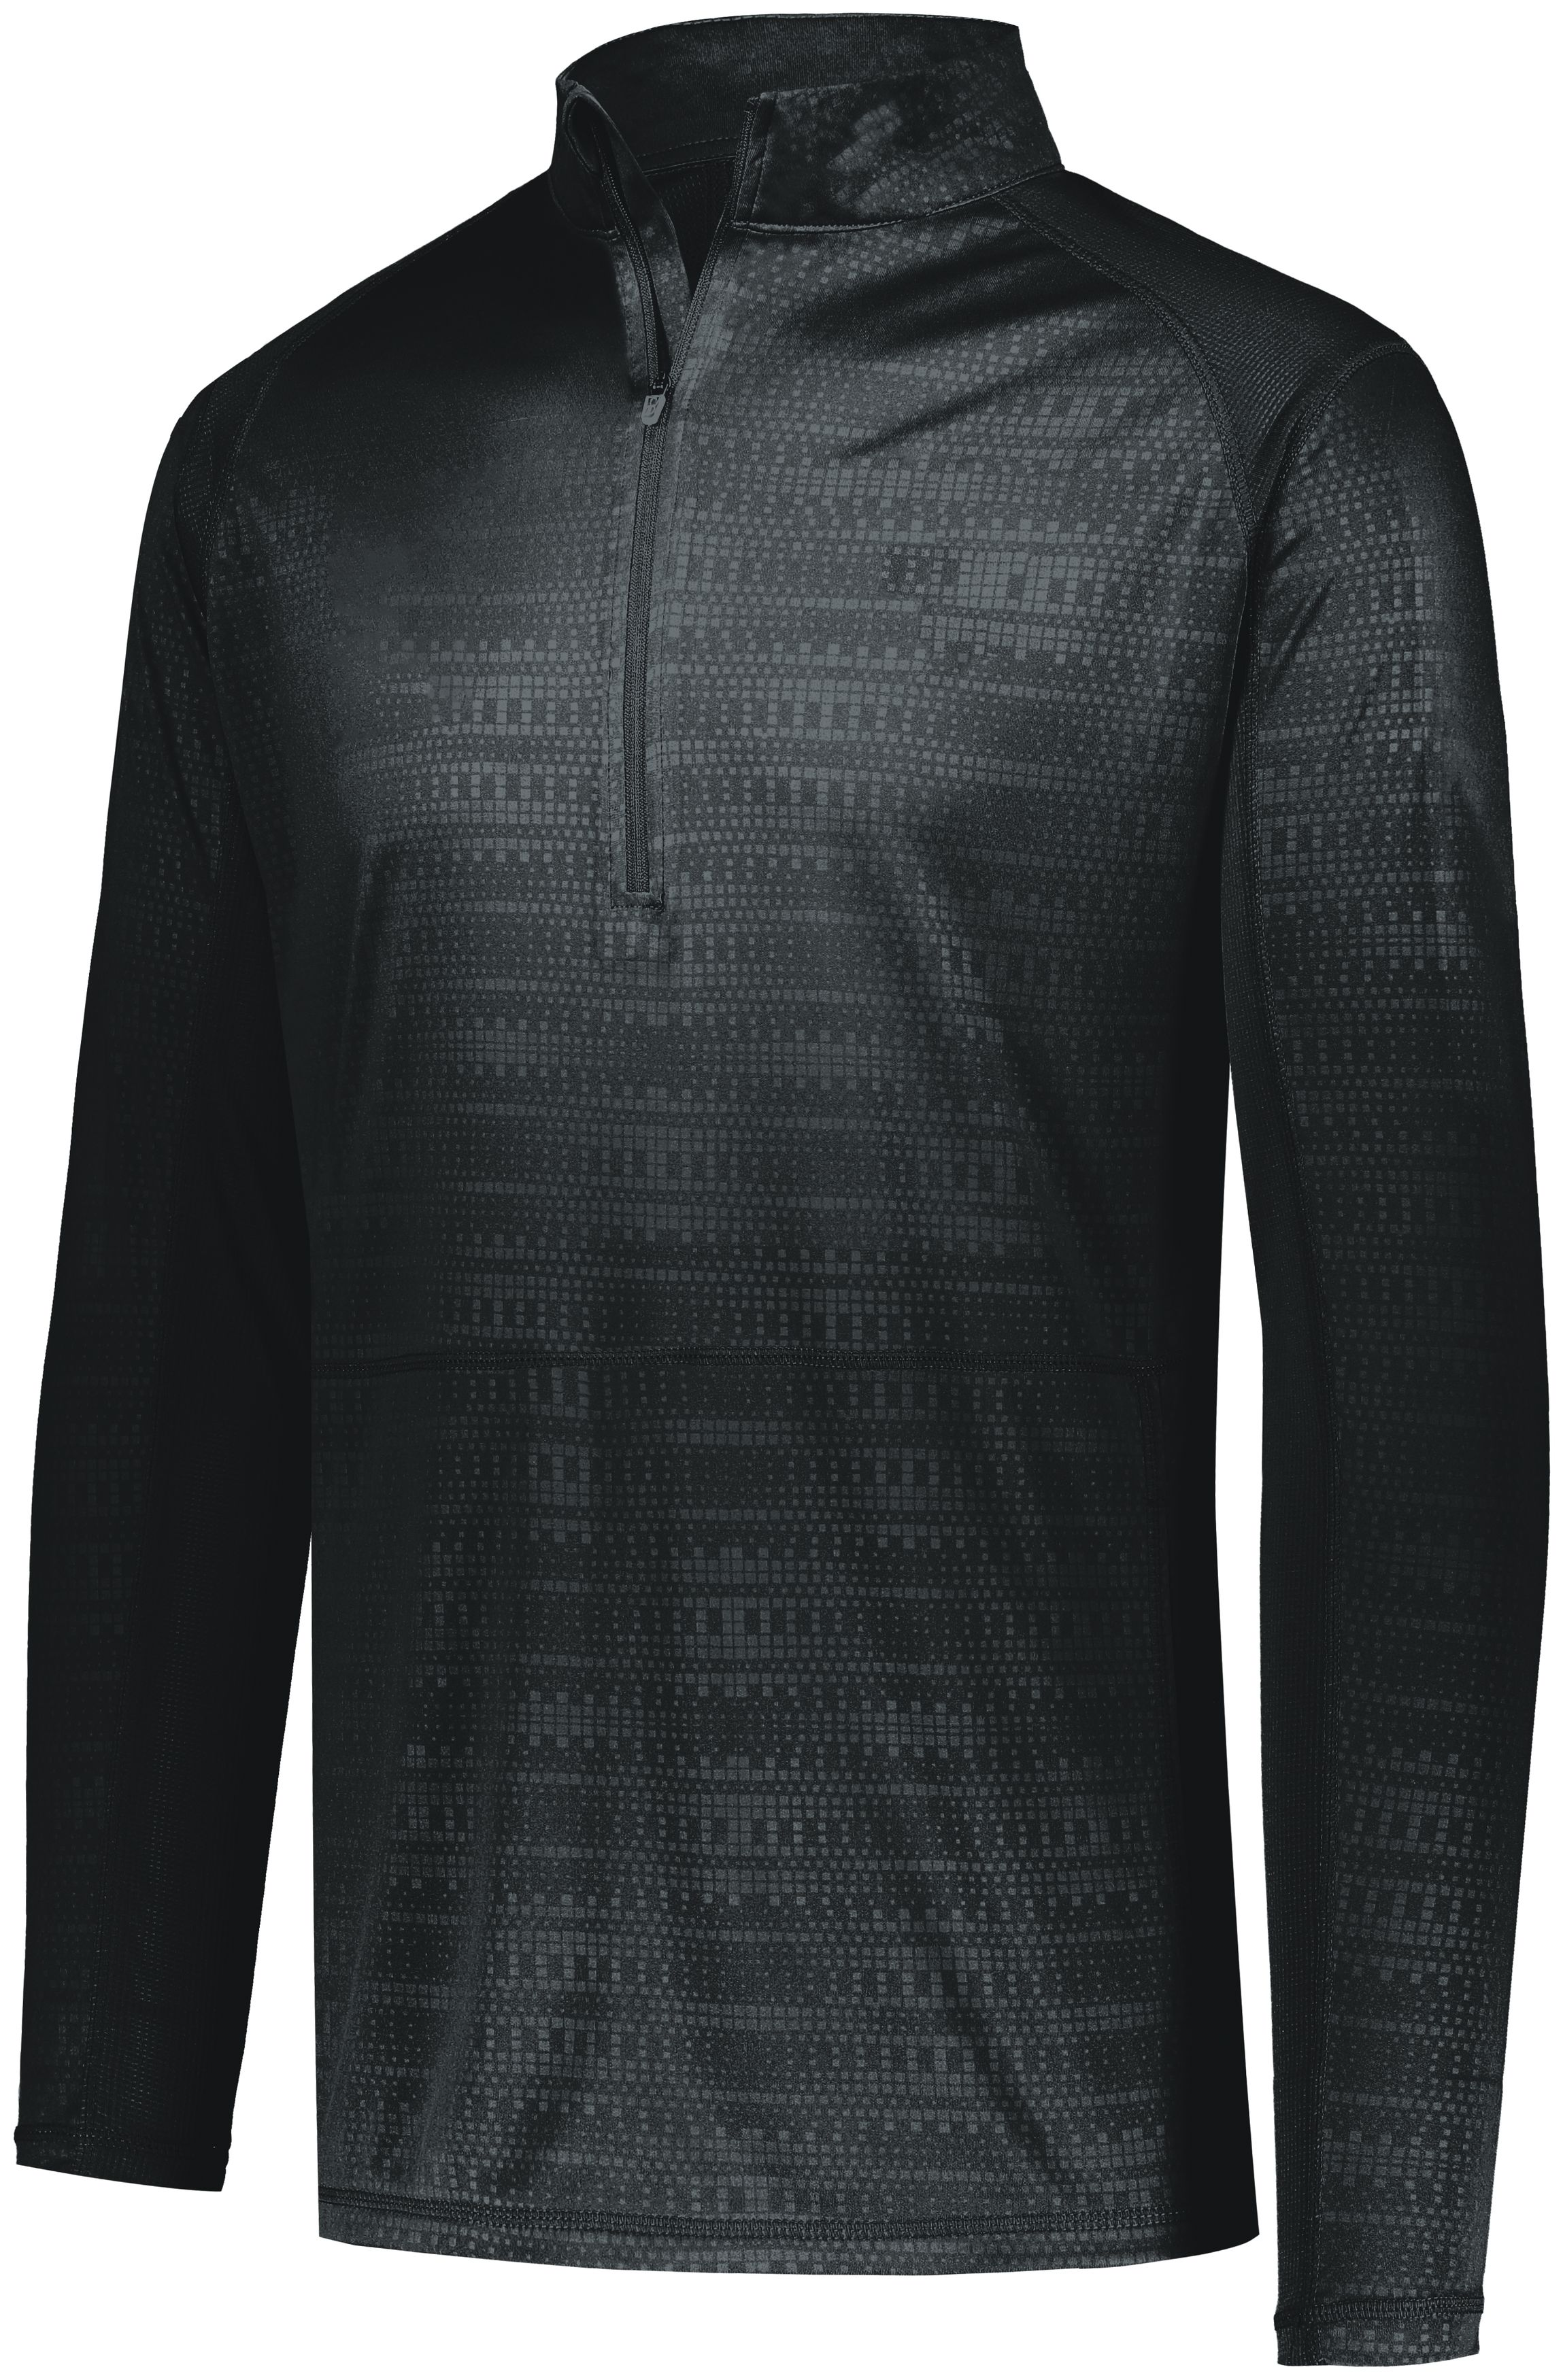 Converge 1/2 Zip Pullover - BLACK